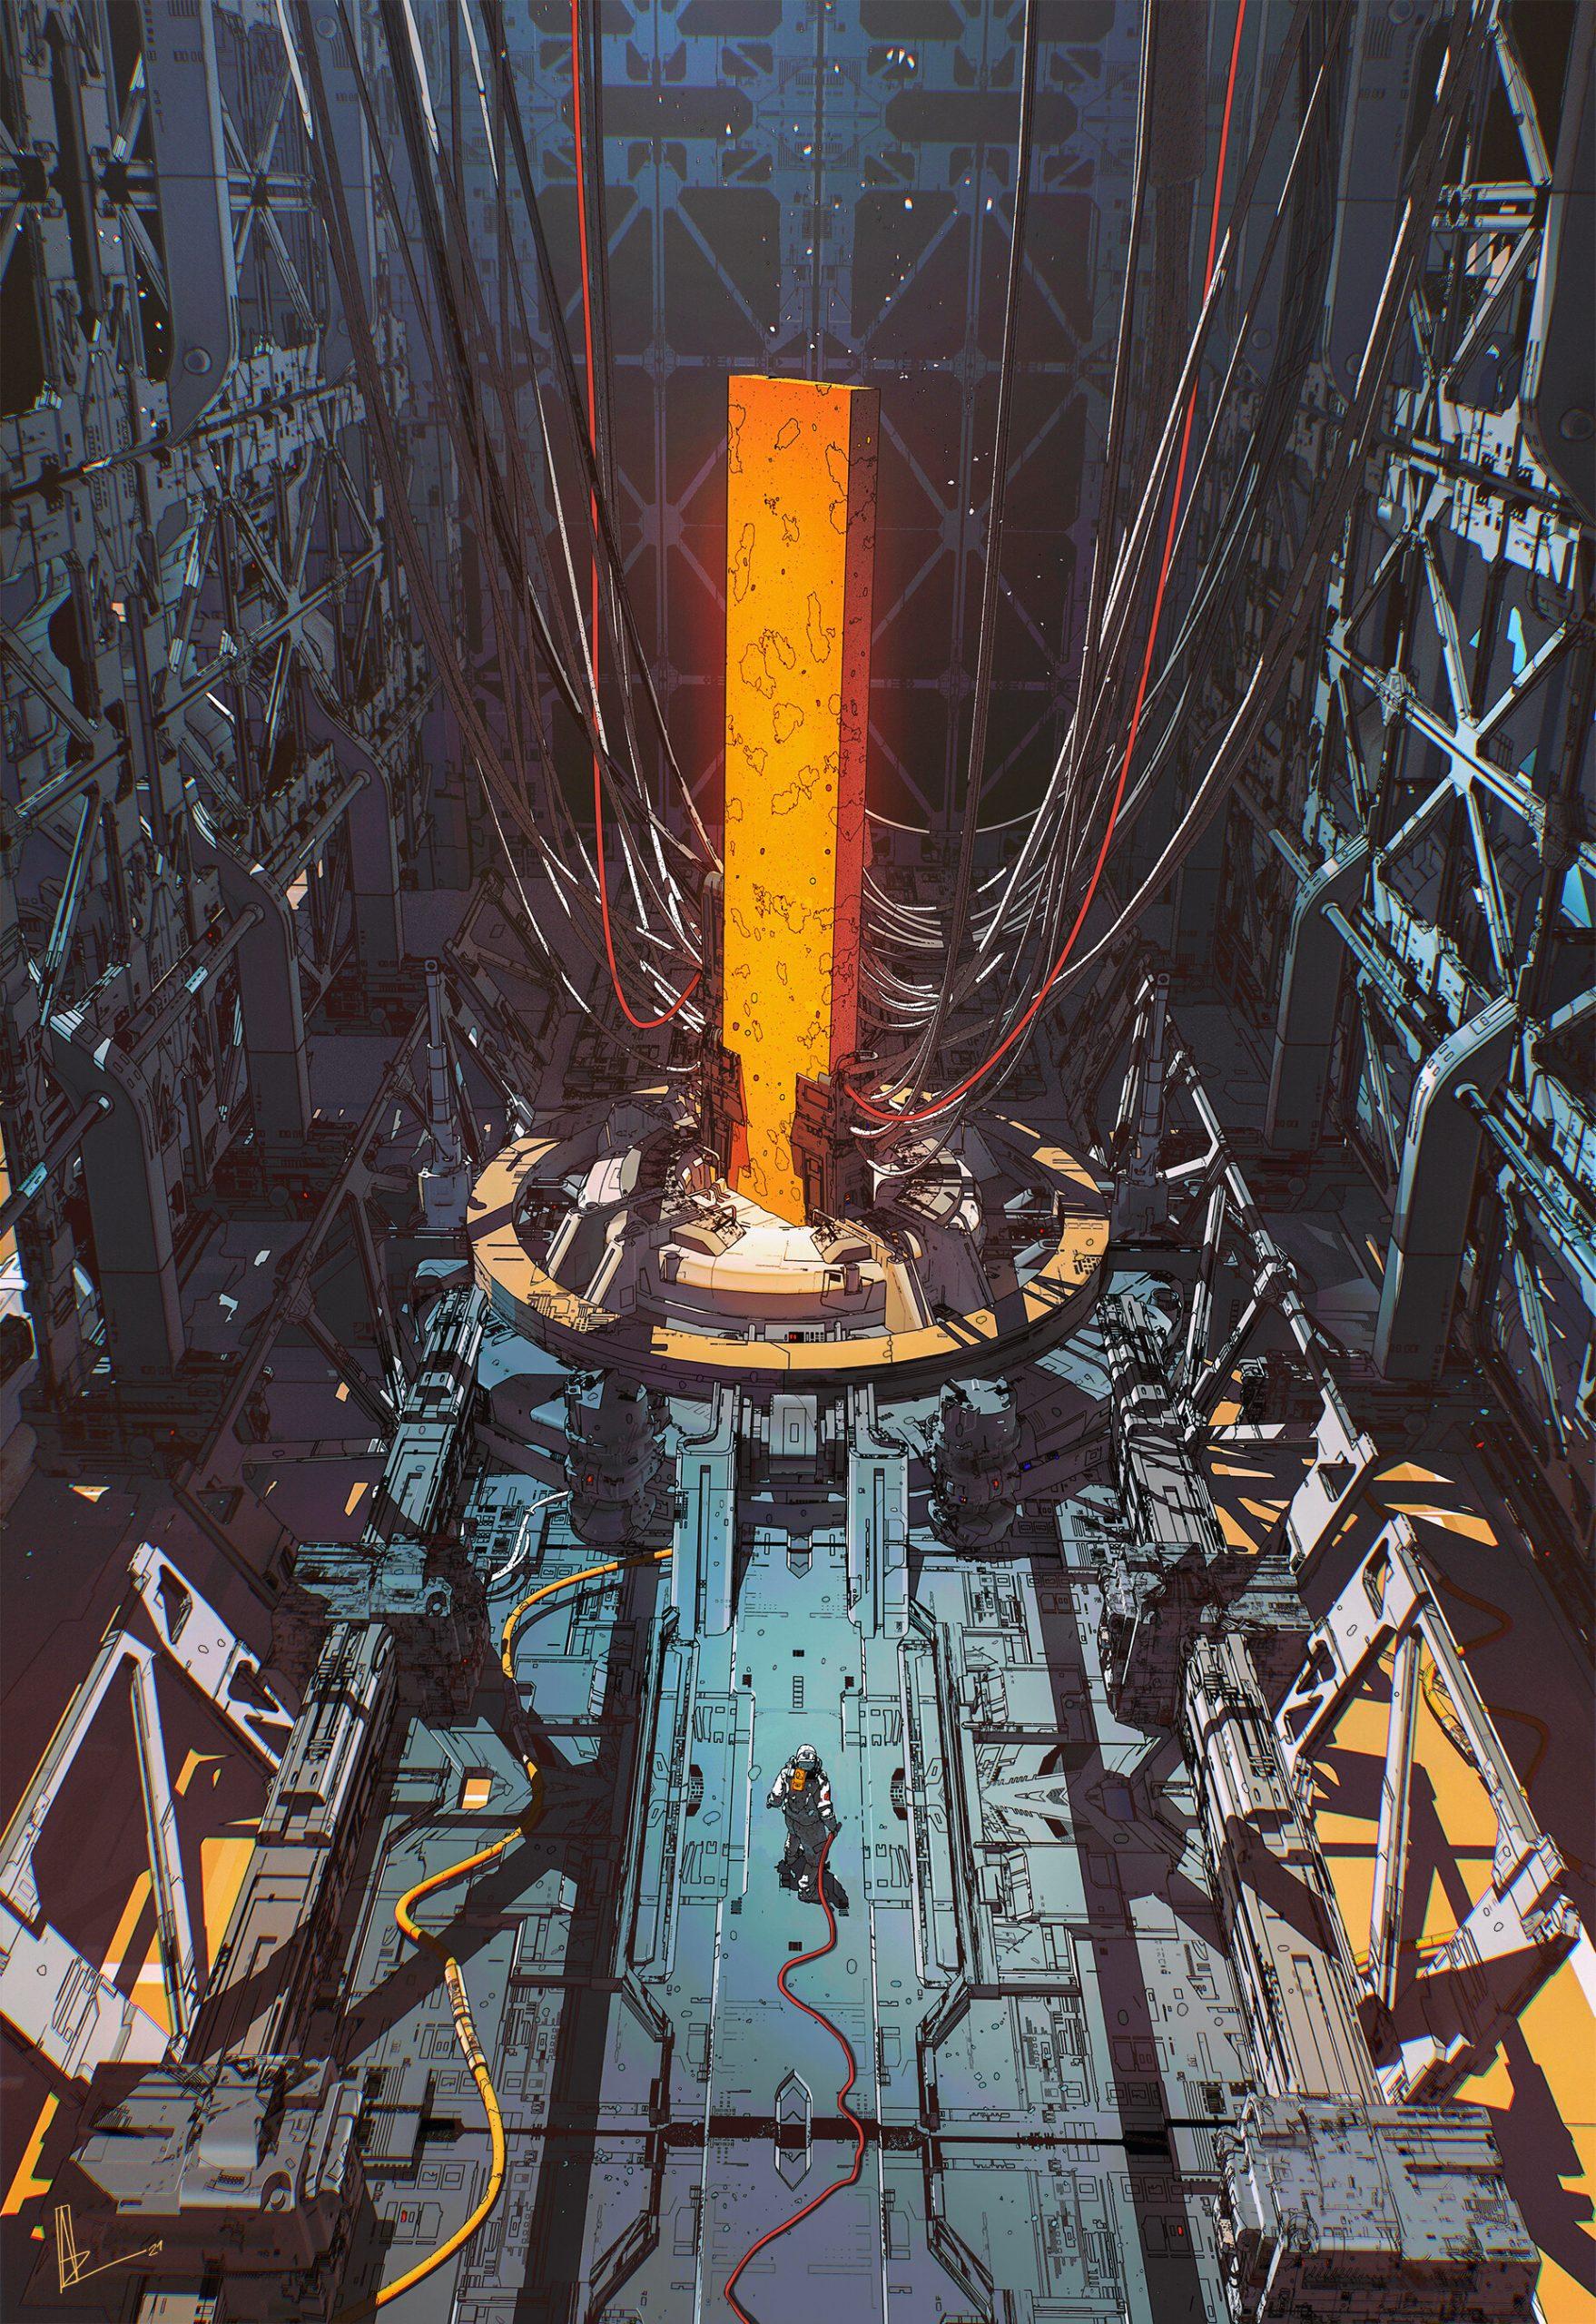 The Sci-Fi Sketches & Artworks of Amir Zand